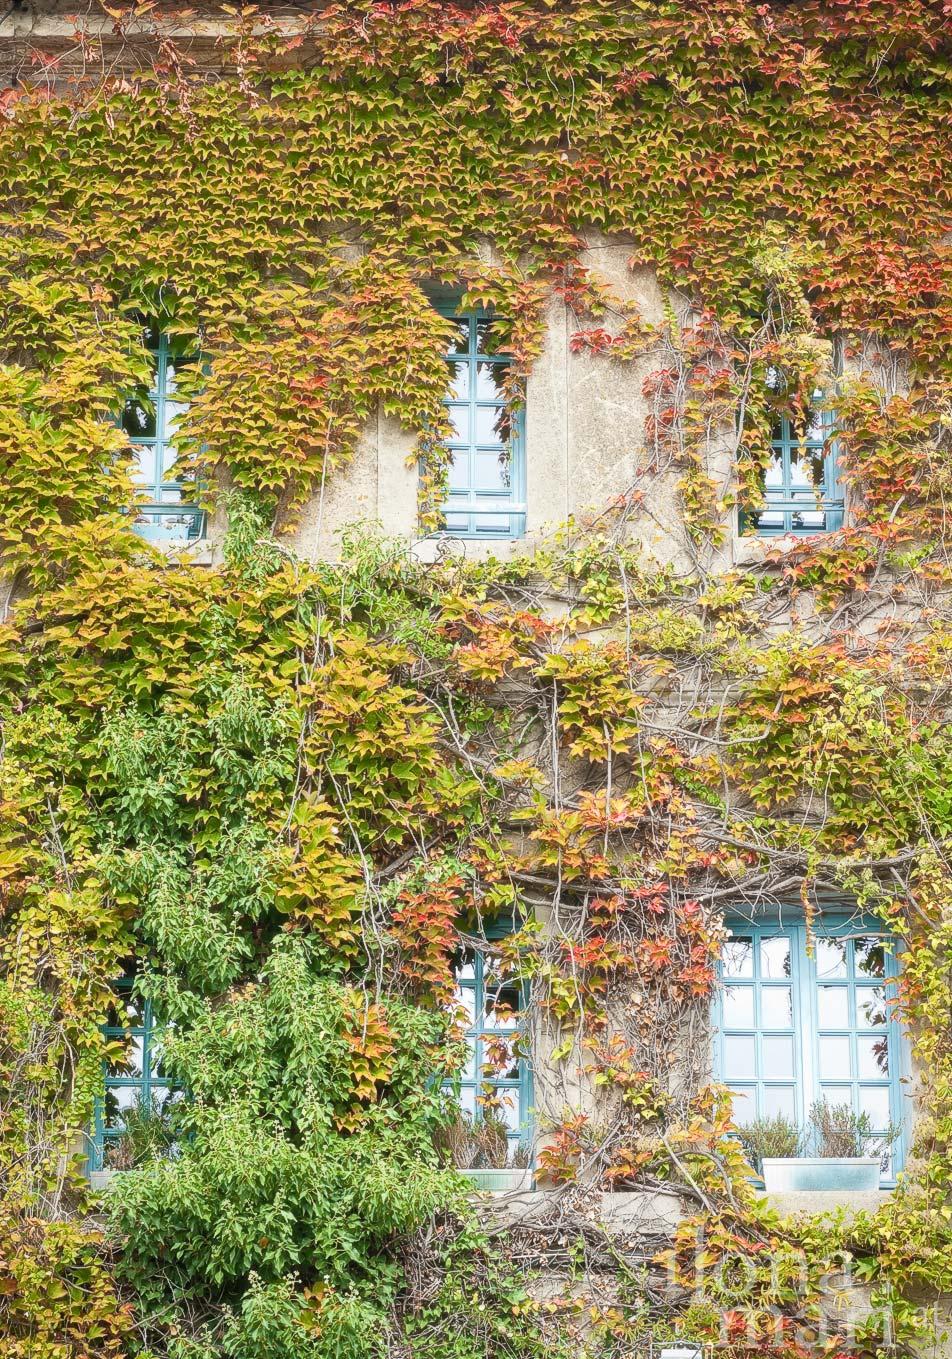 Efeubewachsene Fassade in Beaumont-en-Auge